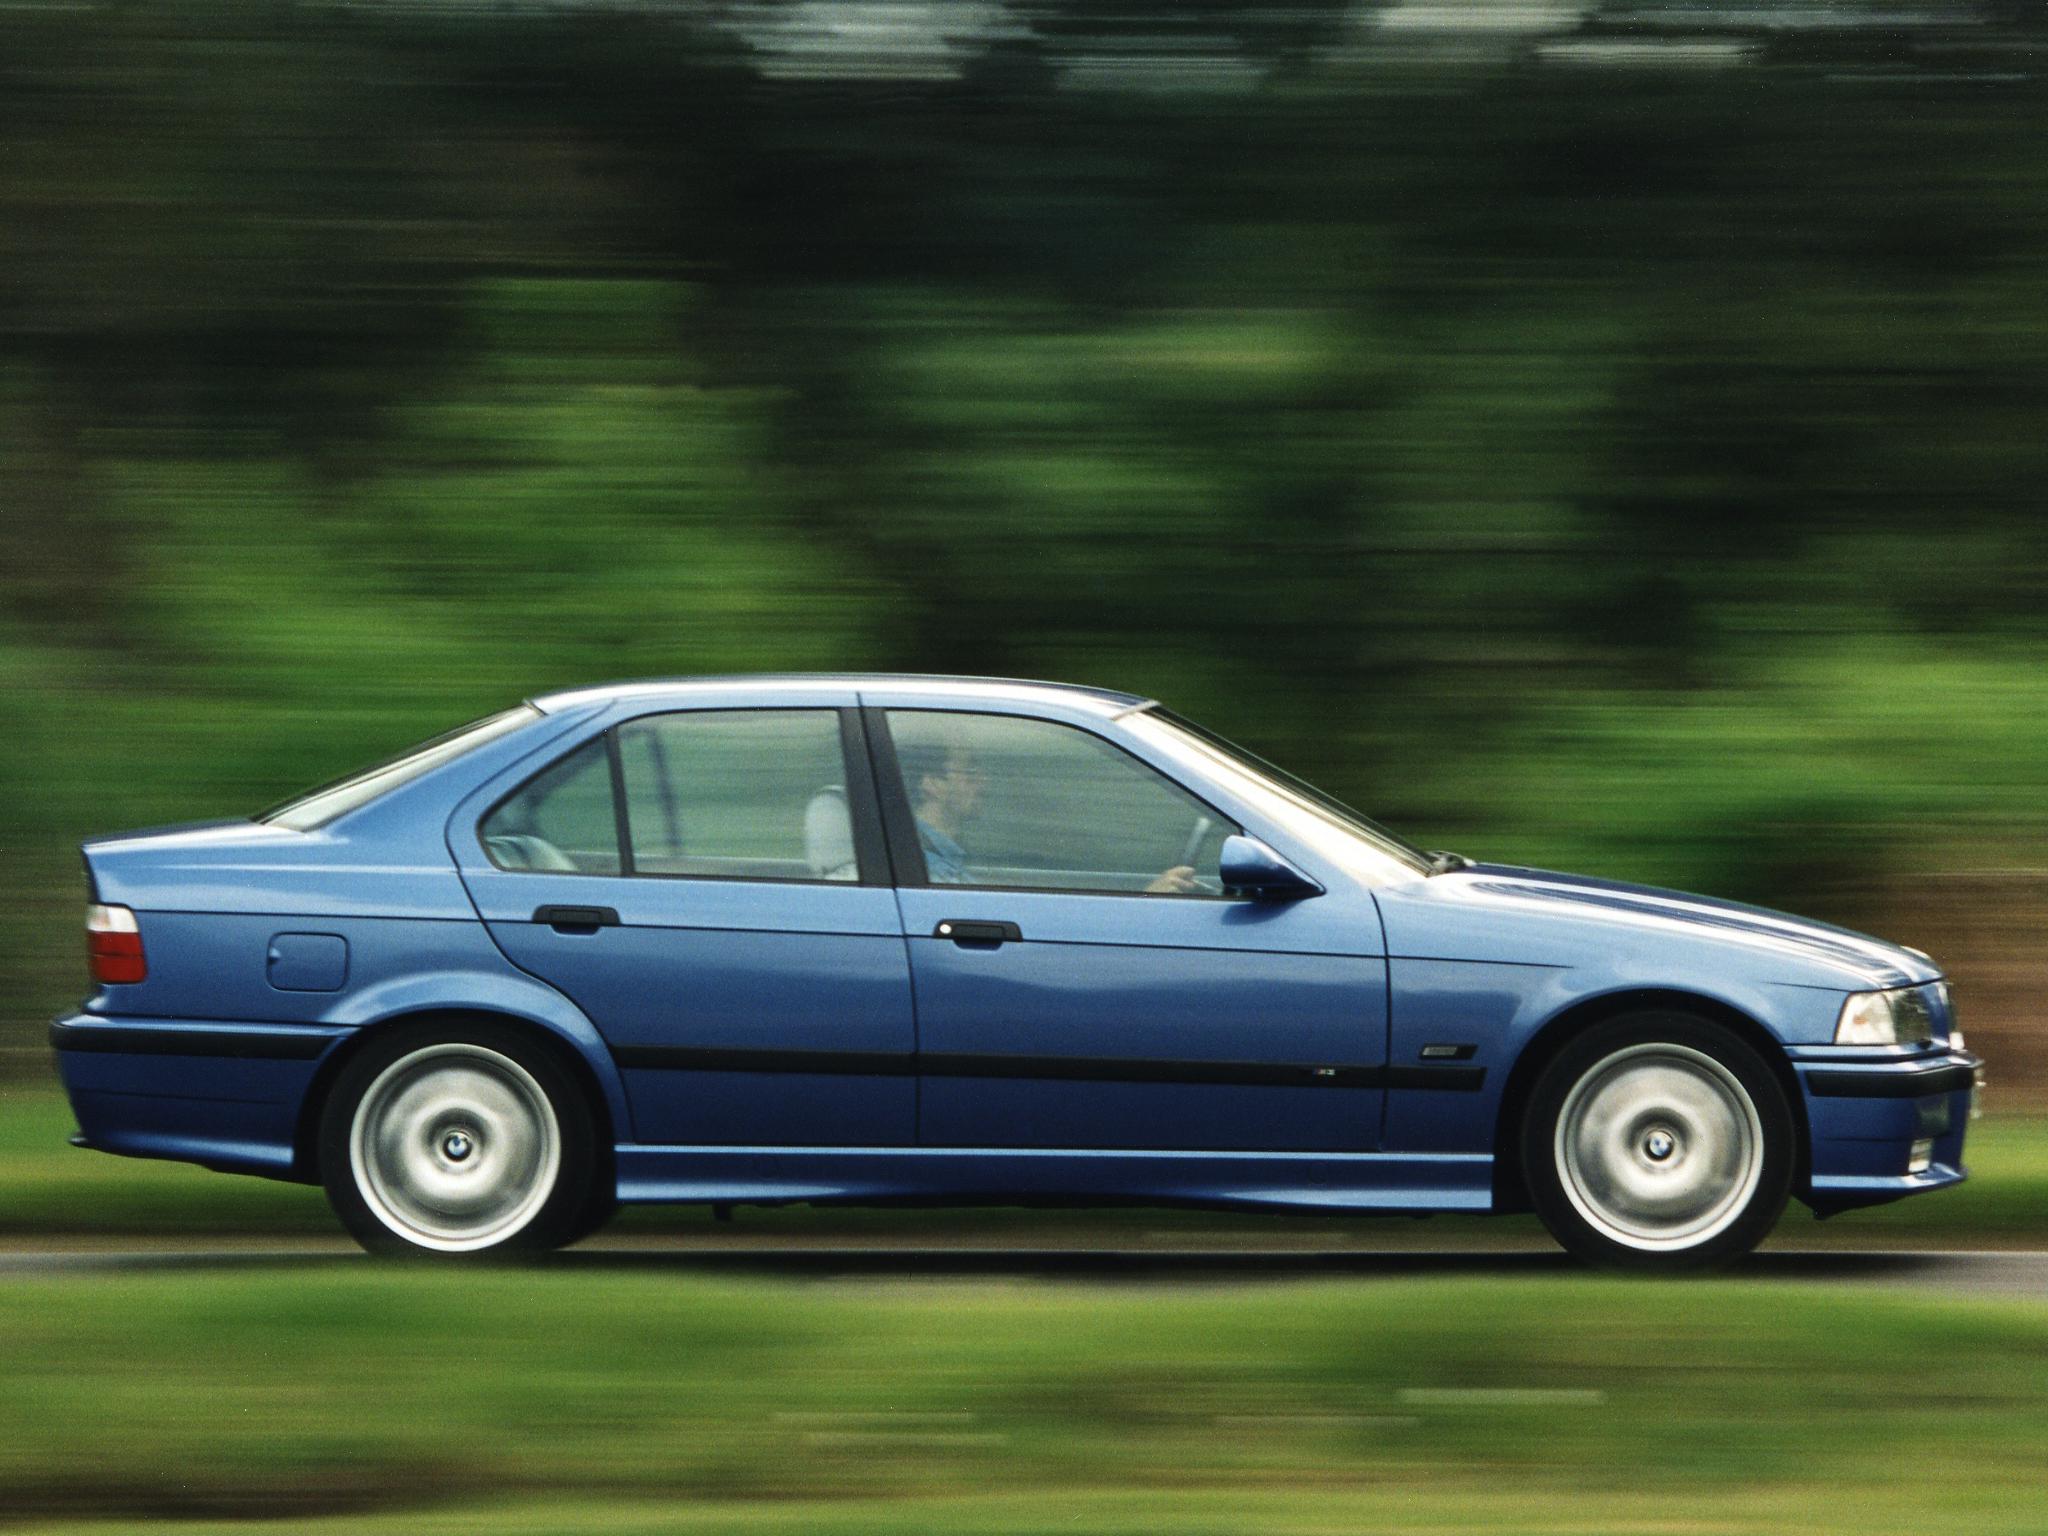 BMW M3 E36 road test - Drive